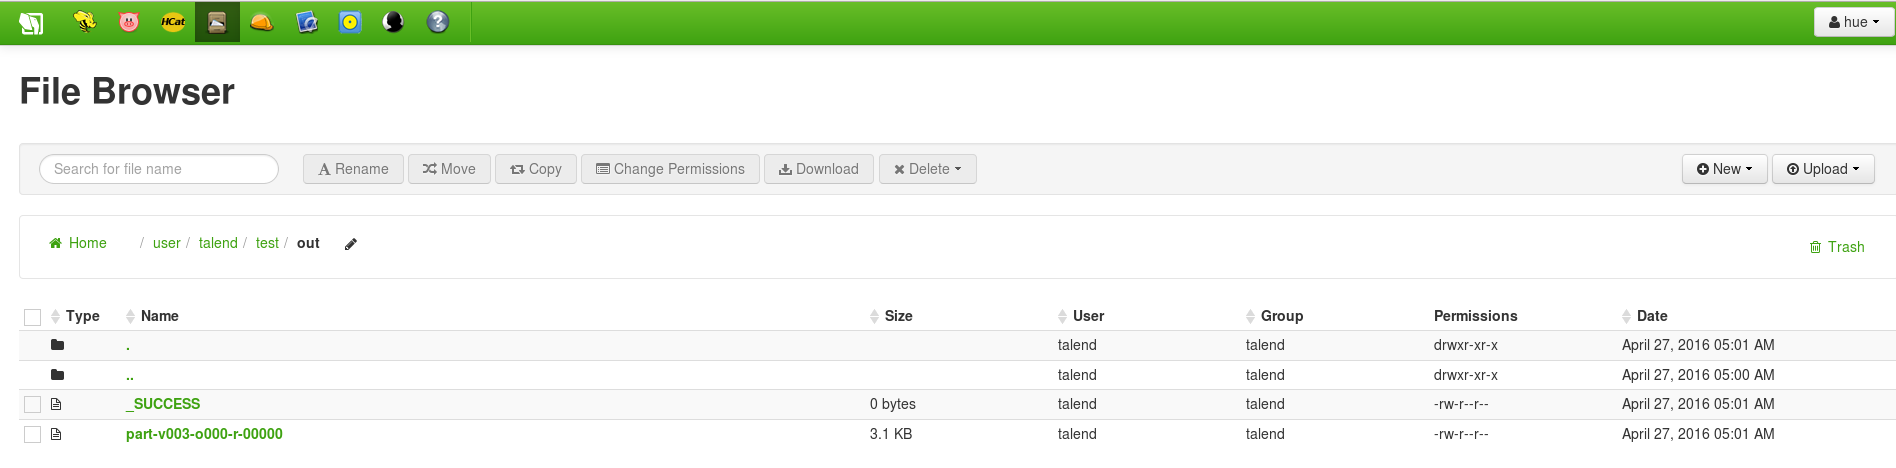 Result in File browser